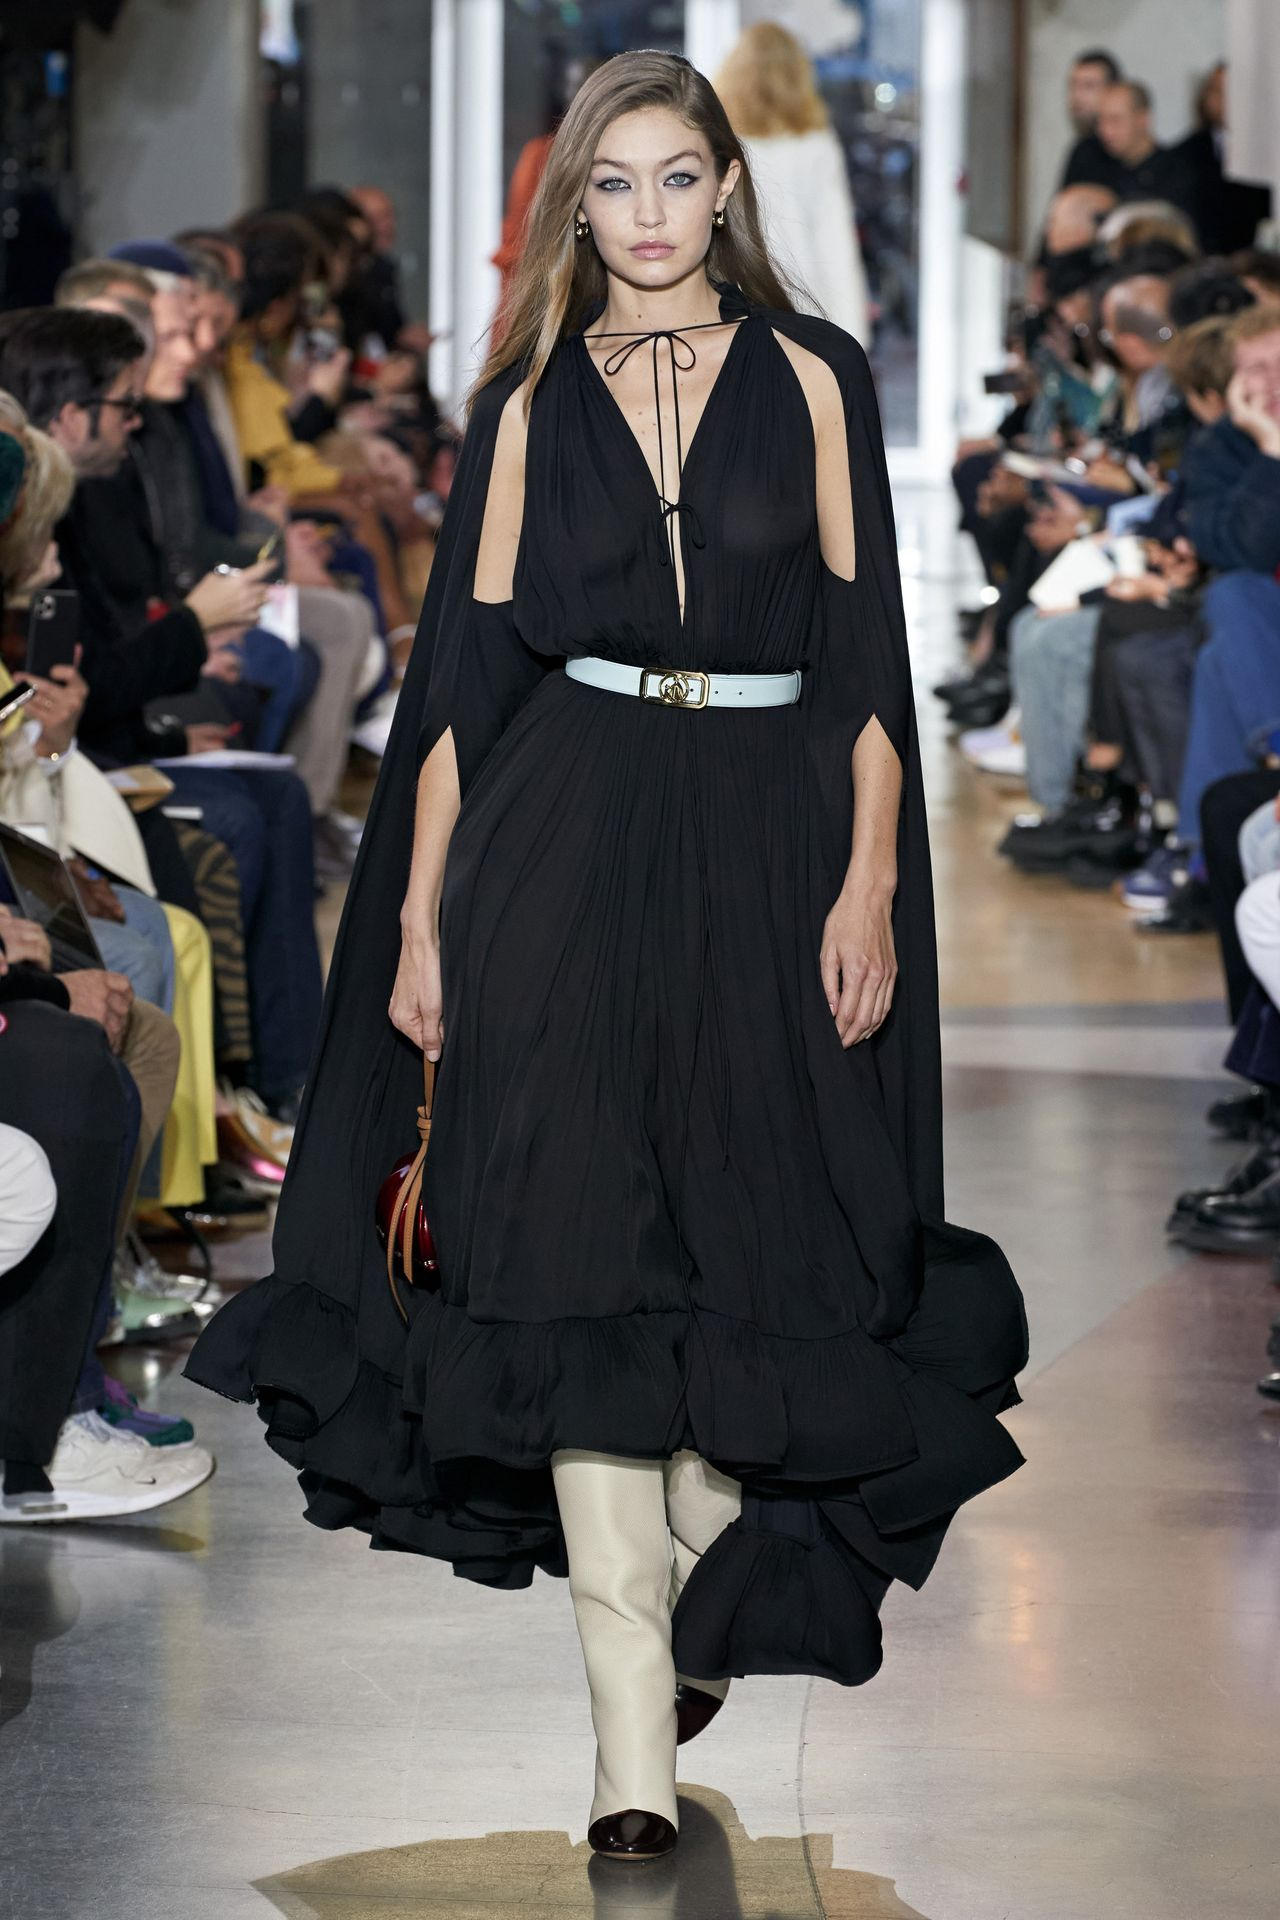 Gigi Hadid Seen Walking The Lanvin Catwalk In Paris 0001